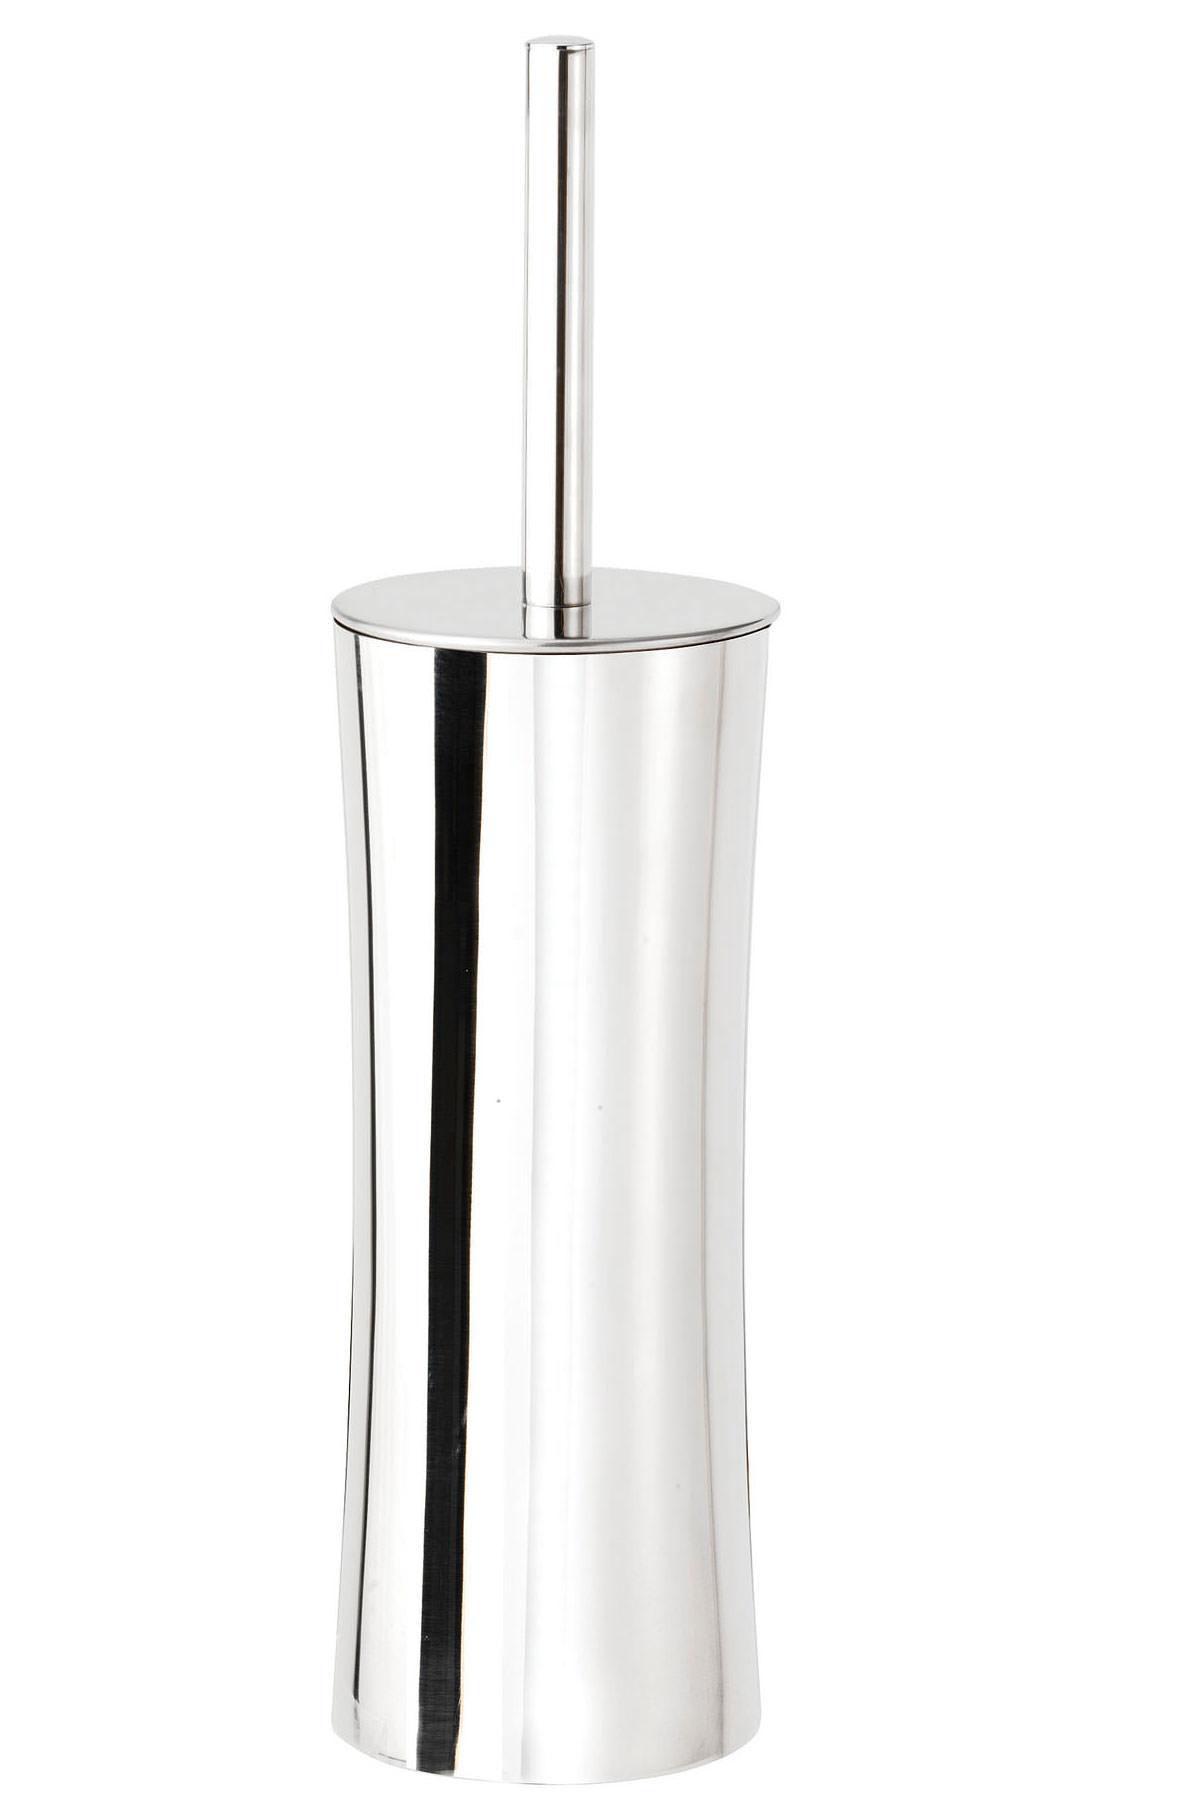 Croydex Freestanding Modular Stainless Steel Toilet Brush And Holder